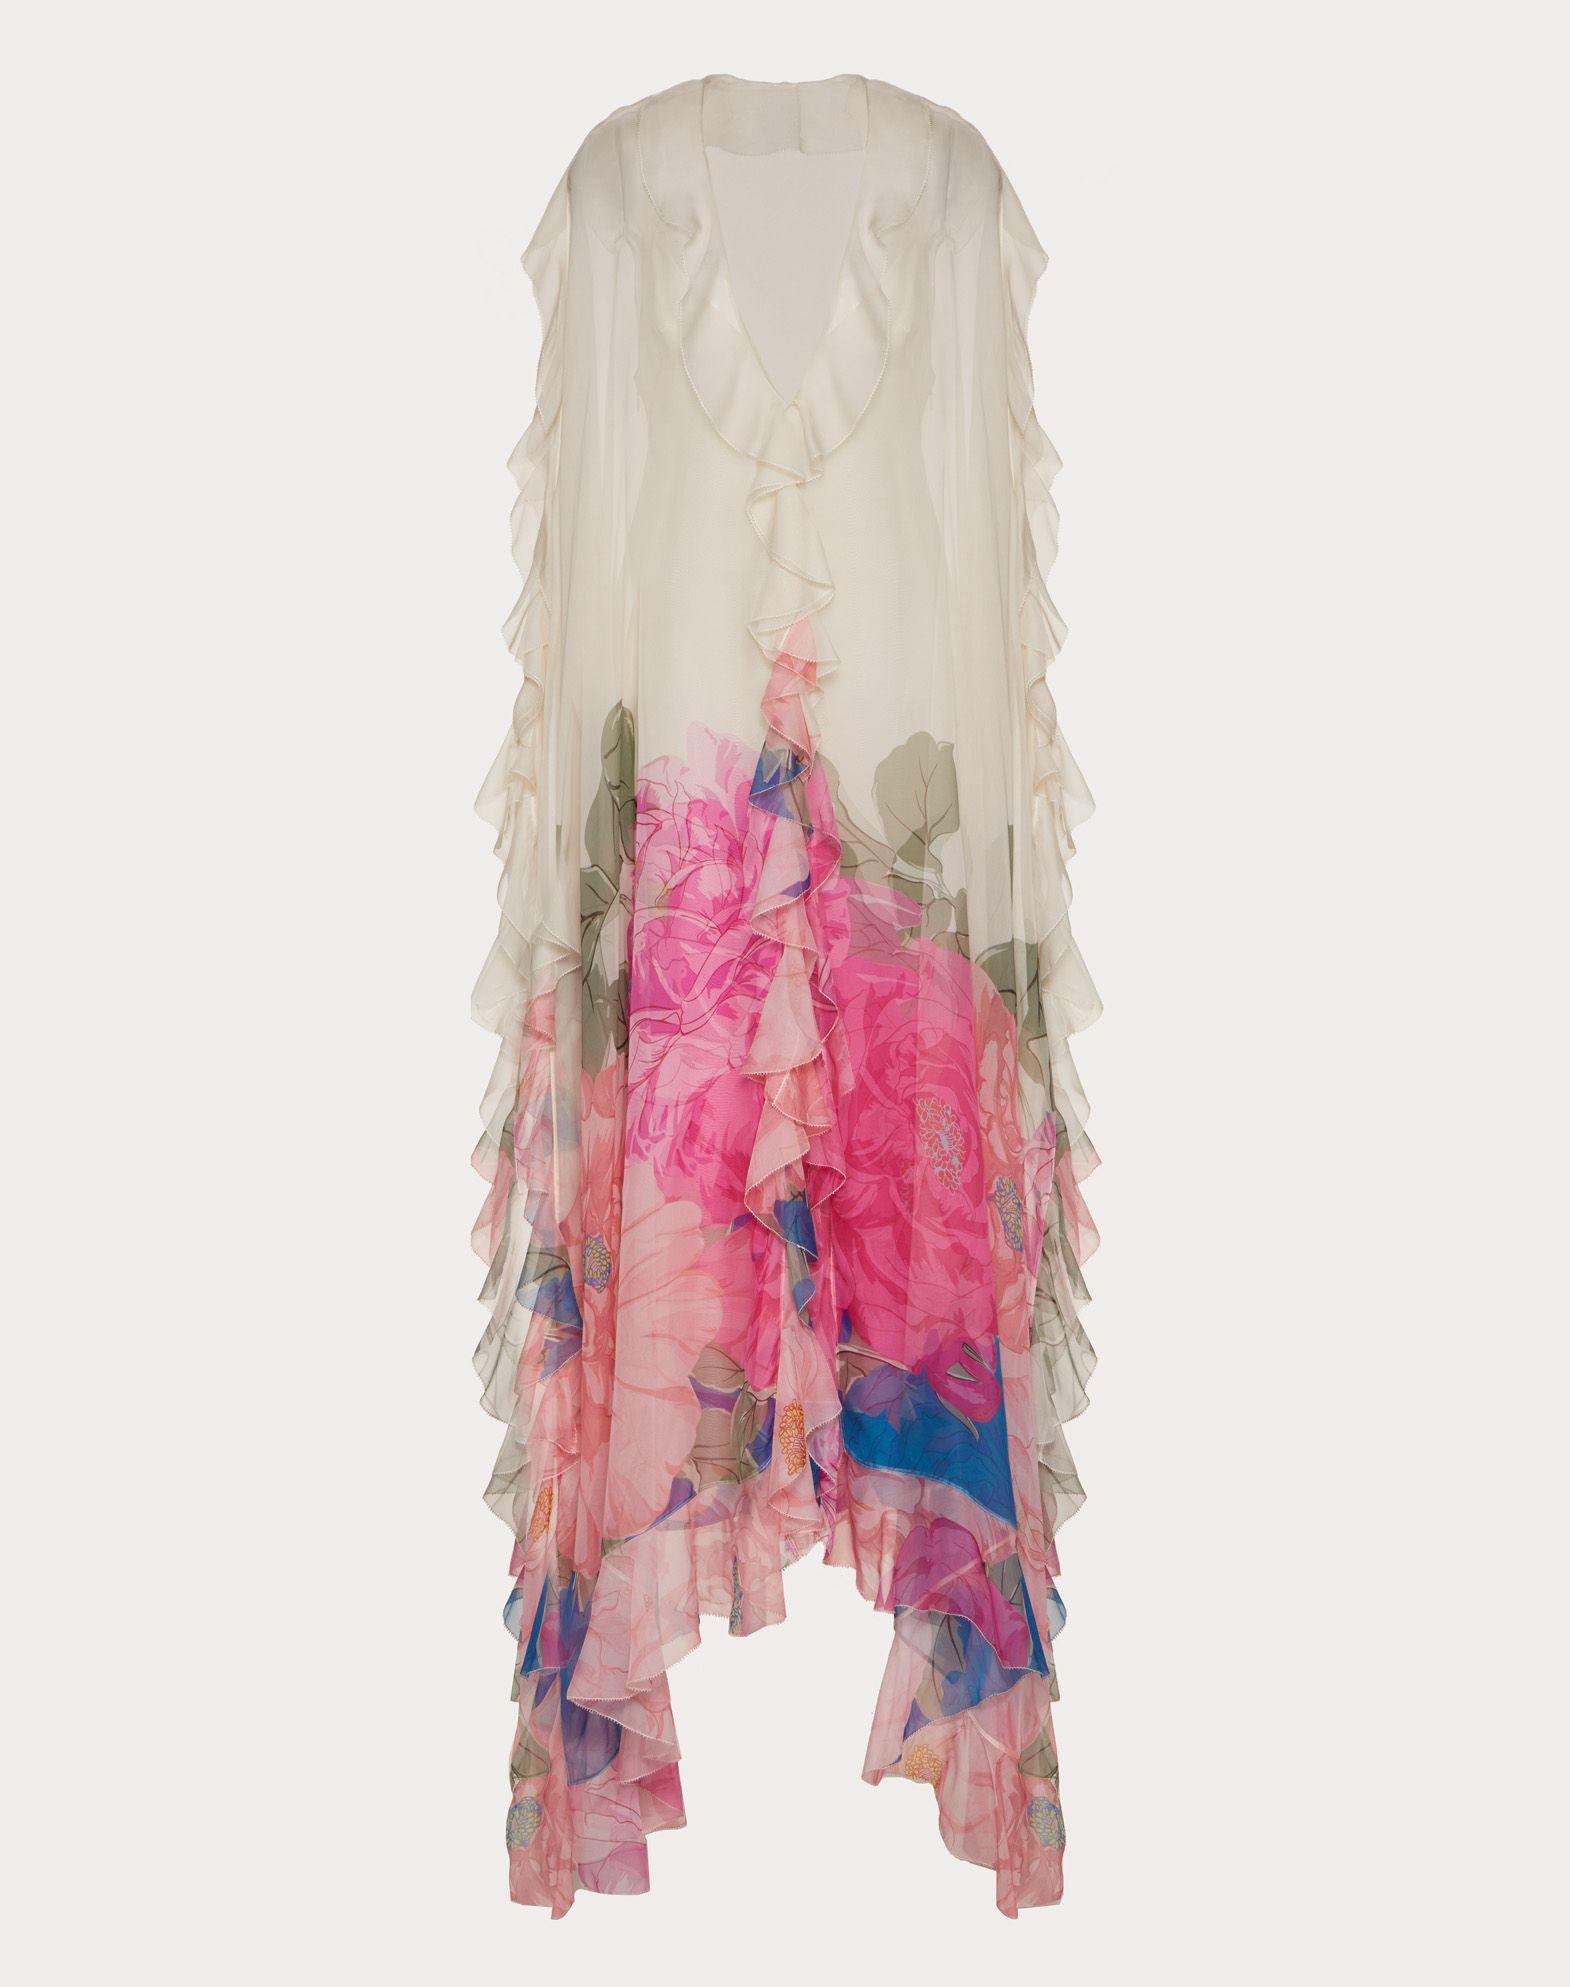 Printed Chiffon Evening Dress